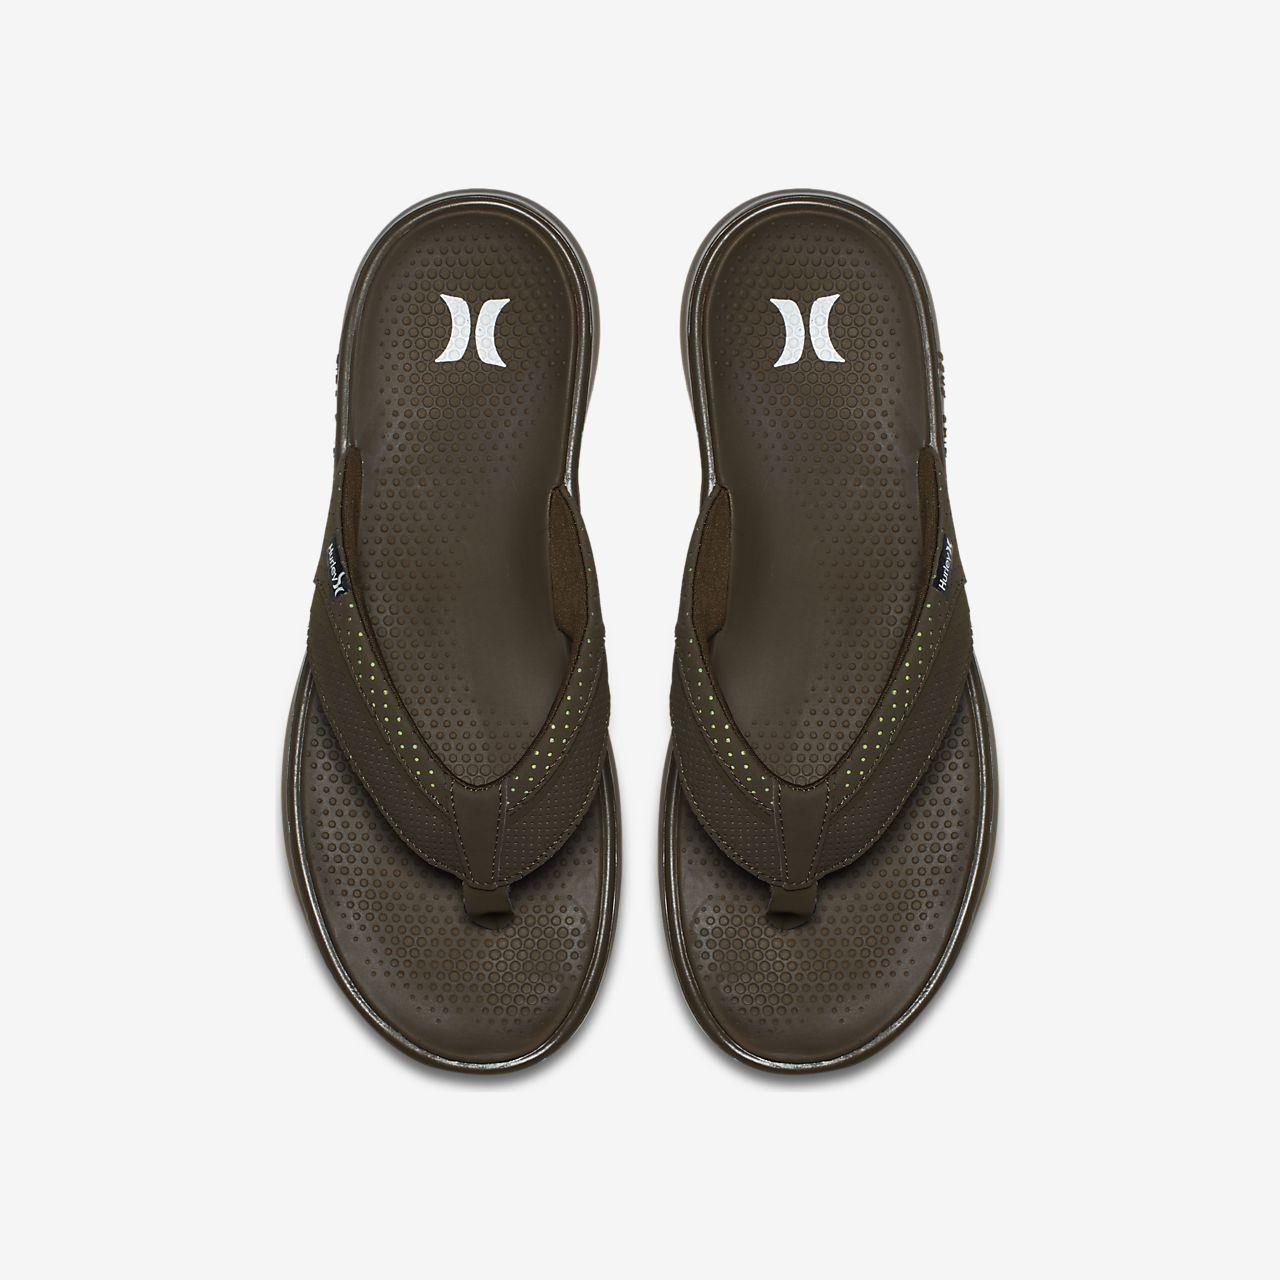 7bc511889e1 Hurley Phantom Free Motion Men s Sandal. Nike.com RO